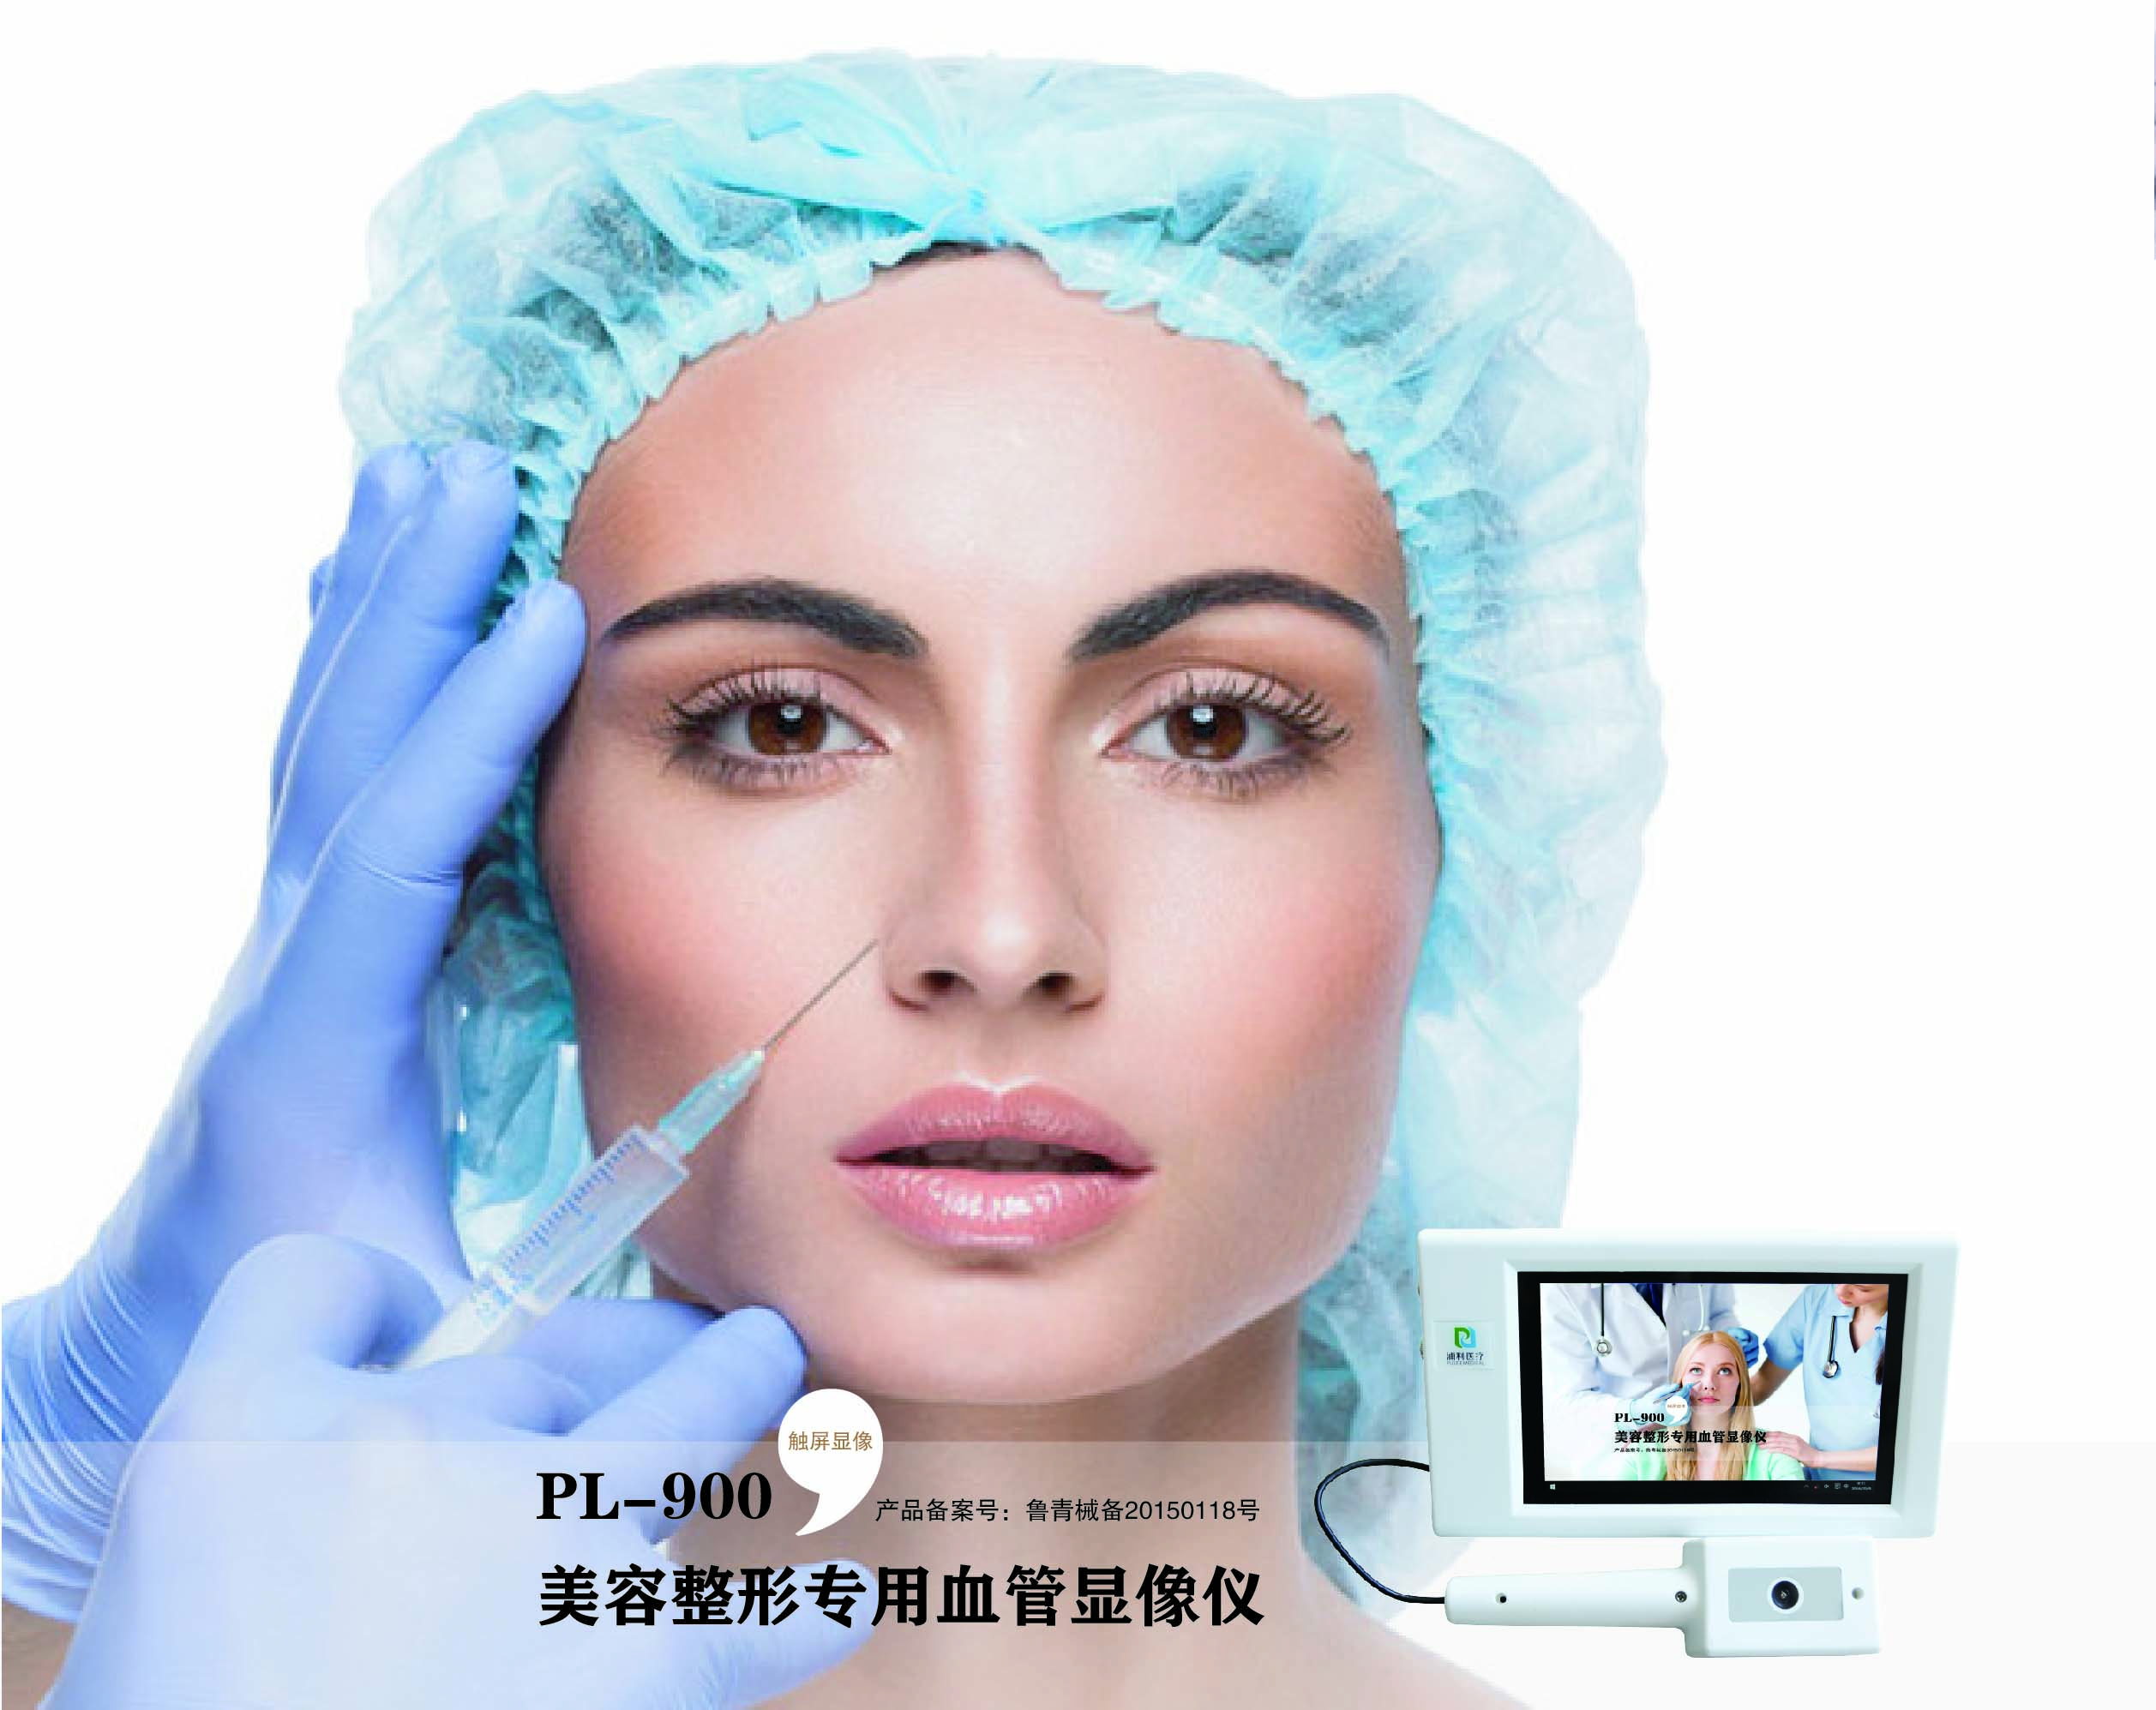 PL-900美容专用血管显像仪